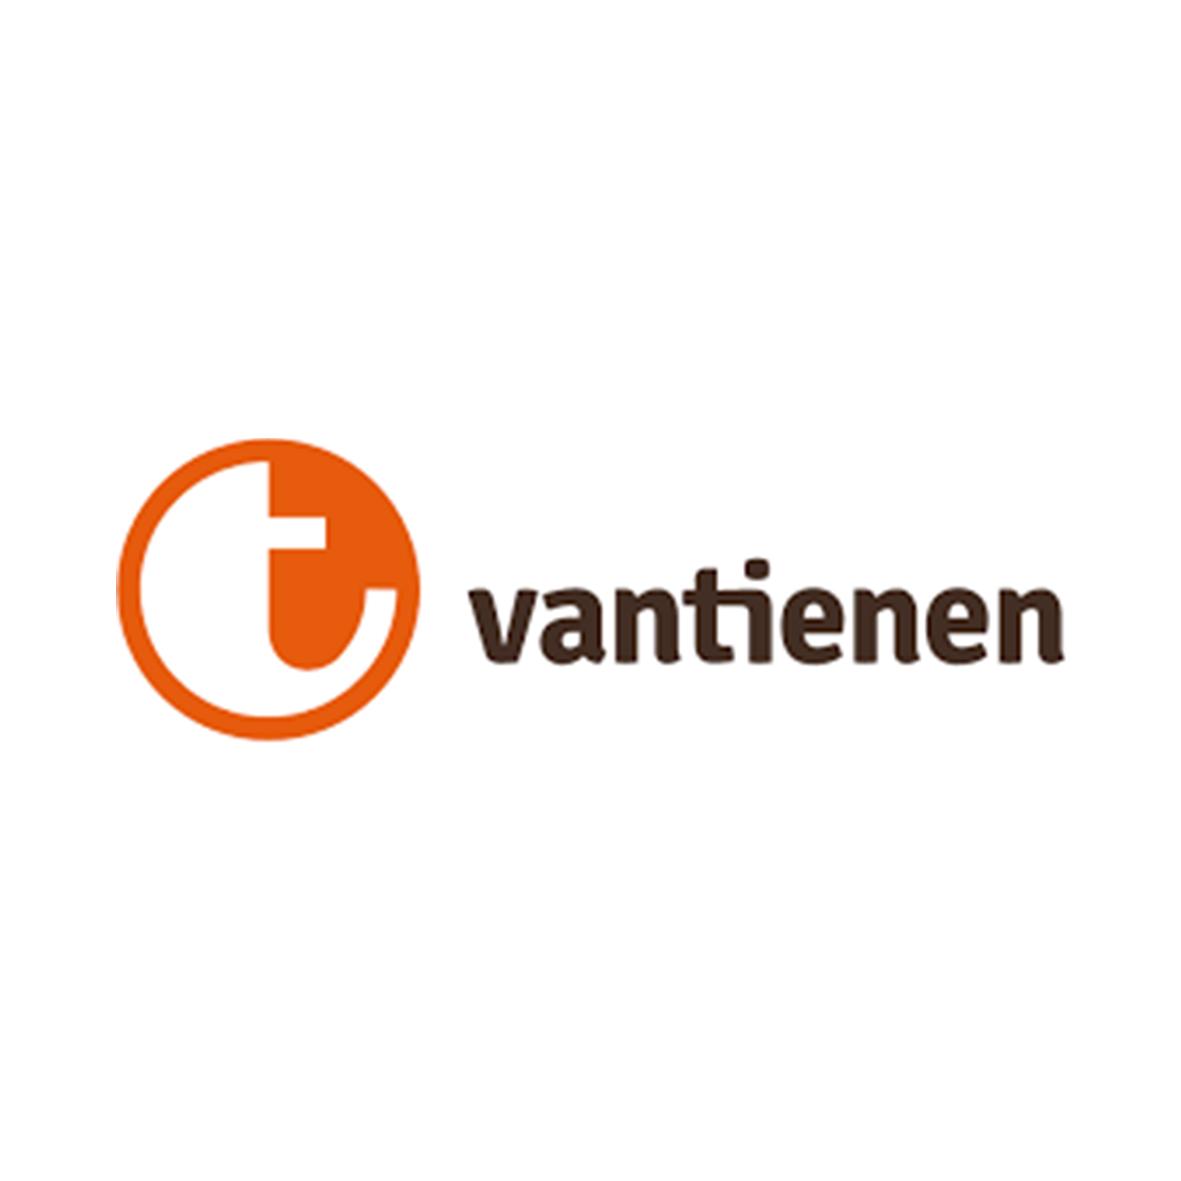 Van_Tienen_Drankautomaten